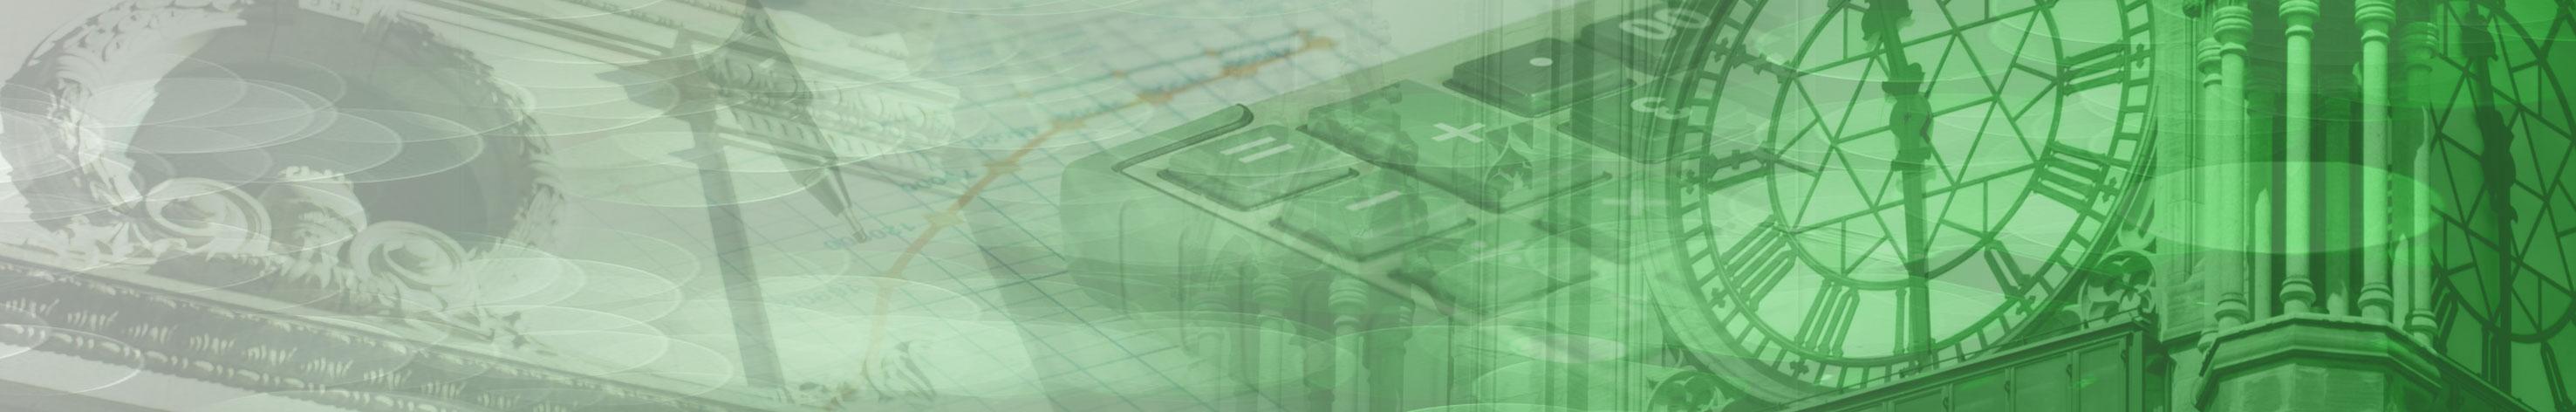 Policy Analysis & Program Evaluation